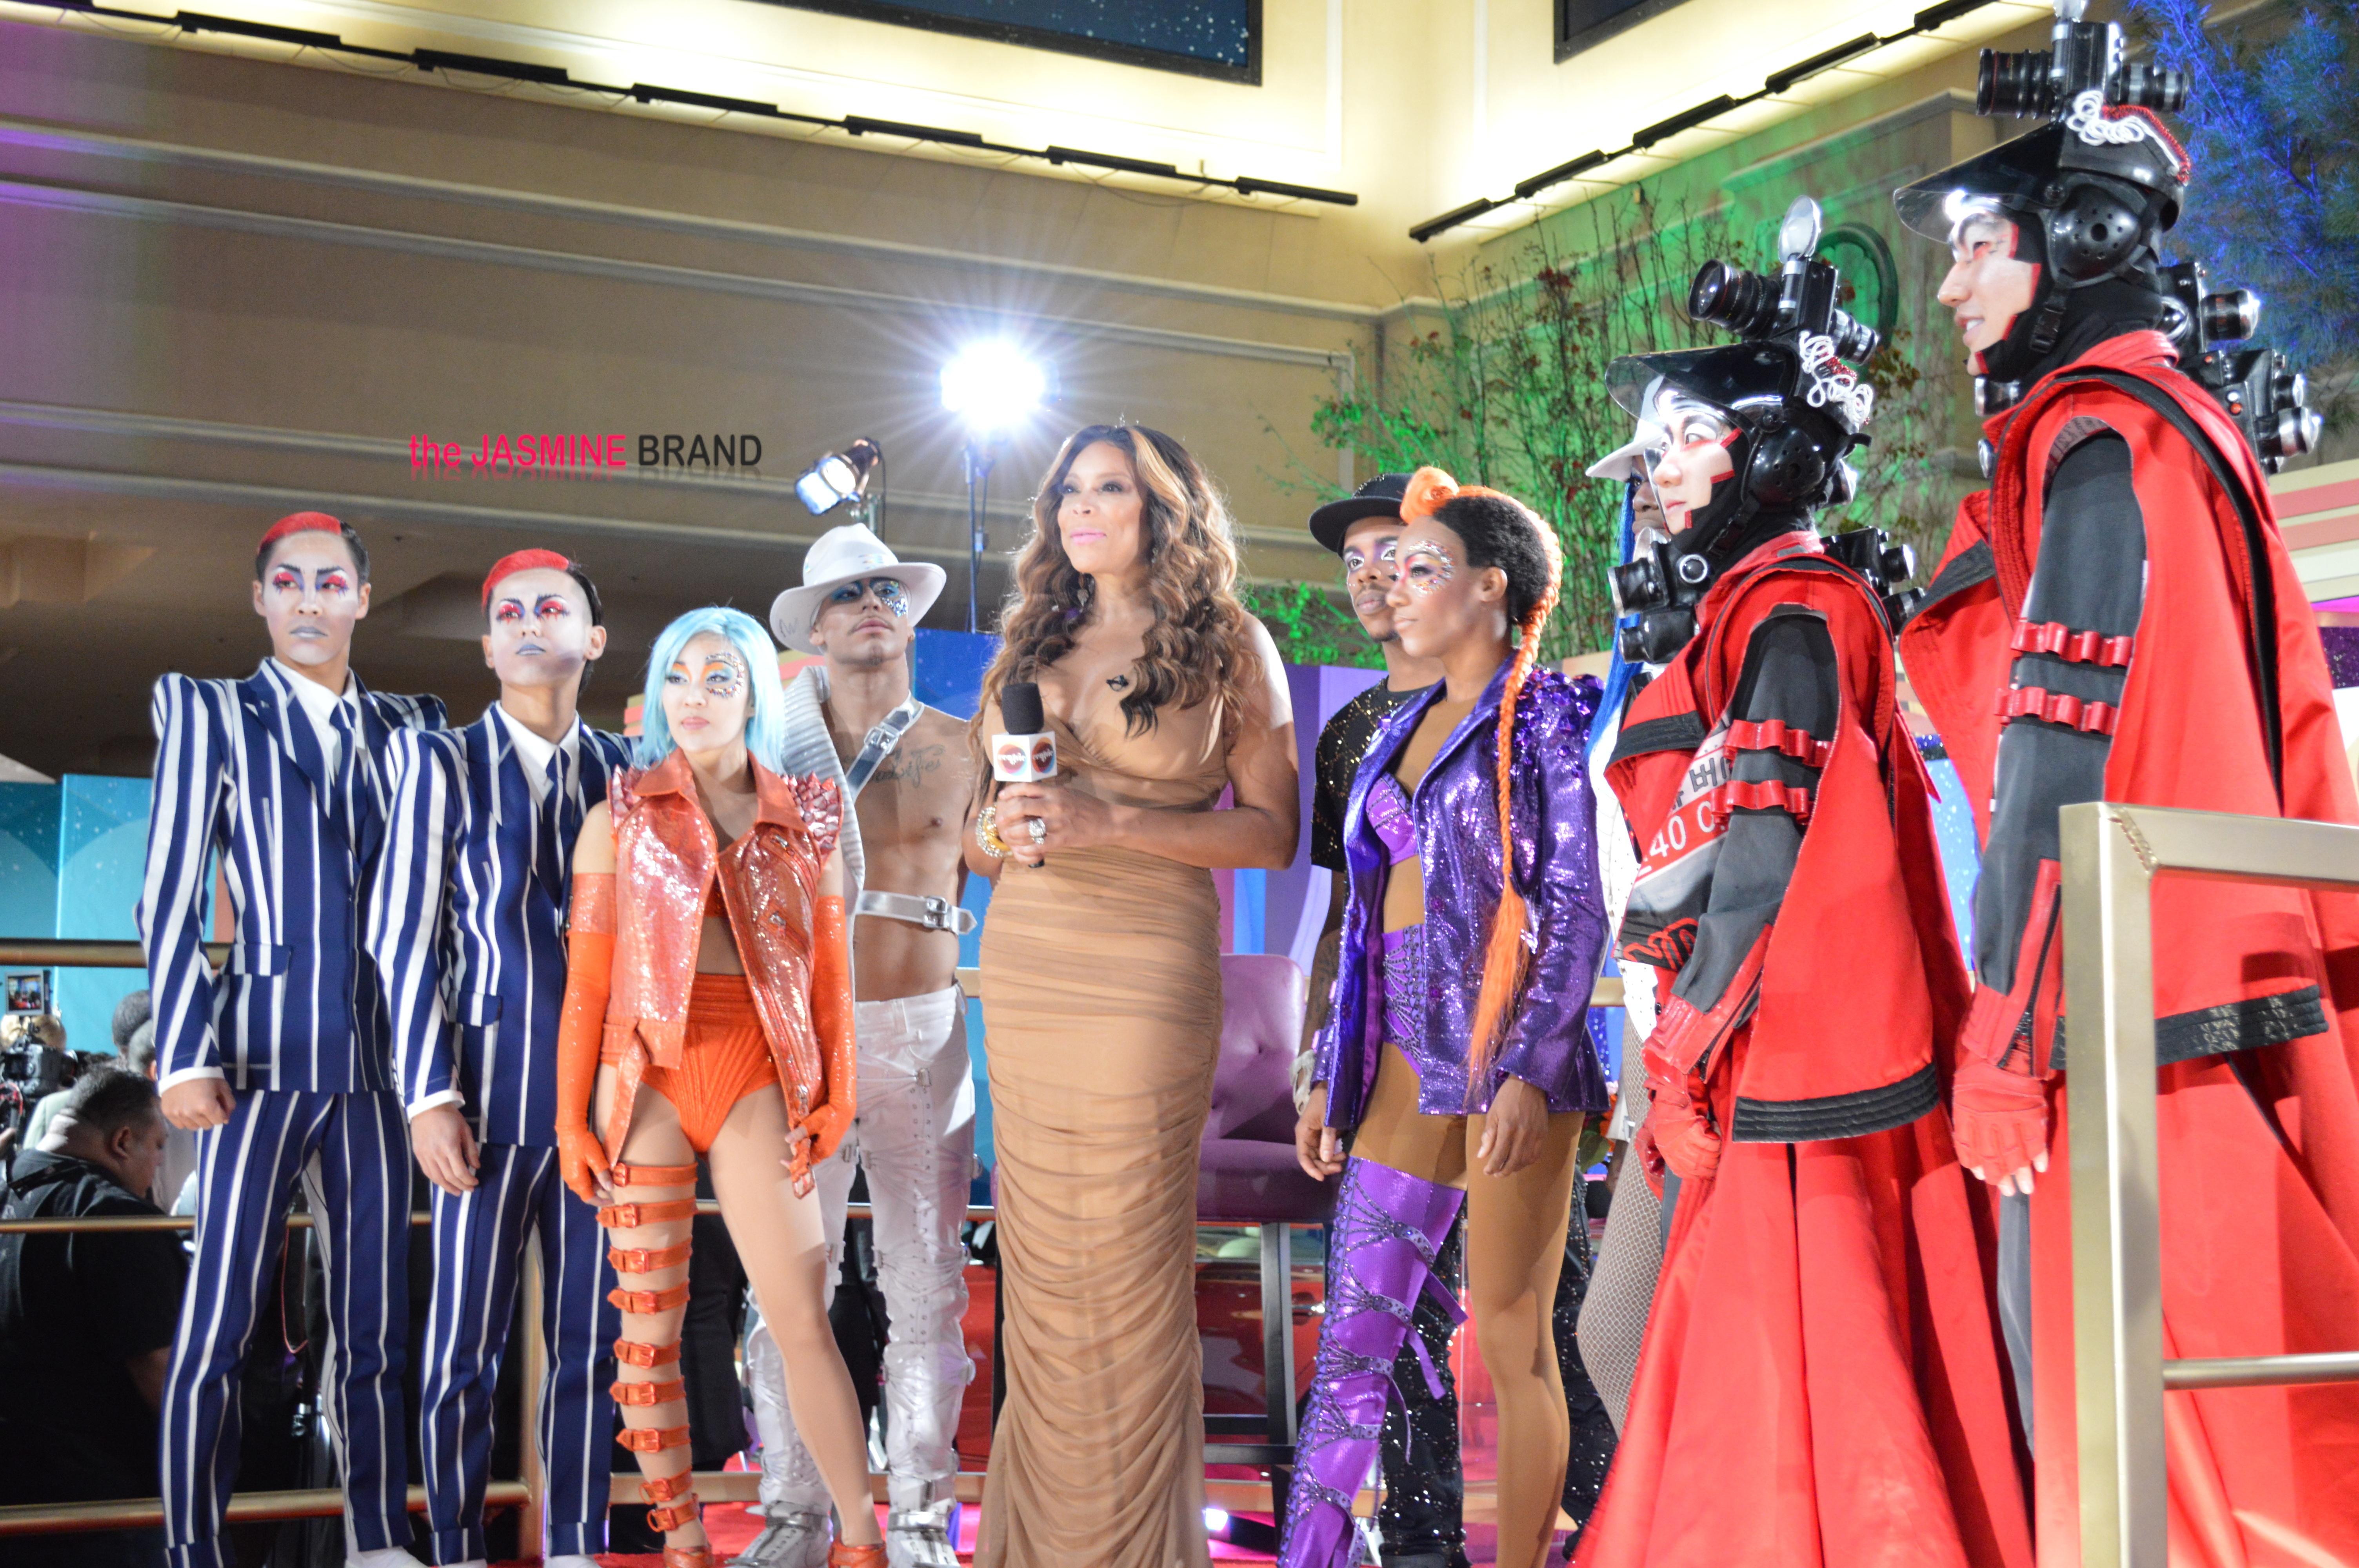 wendy williams-michael jackson 1 cirque soul le-soul train awards 2013-the jasmine brand